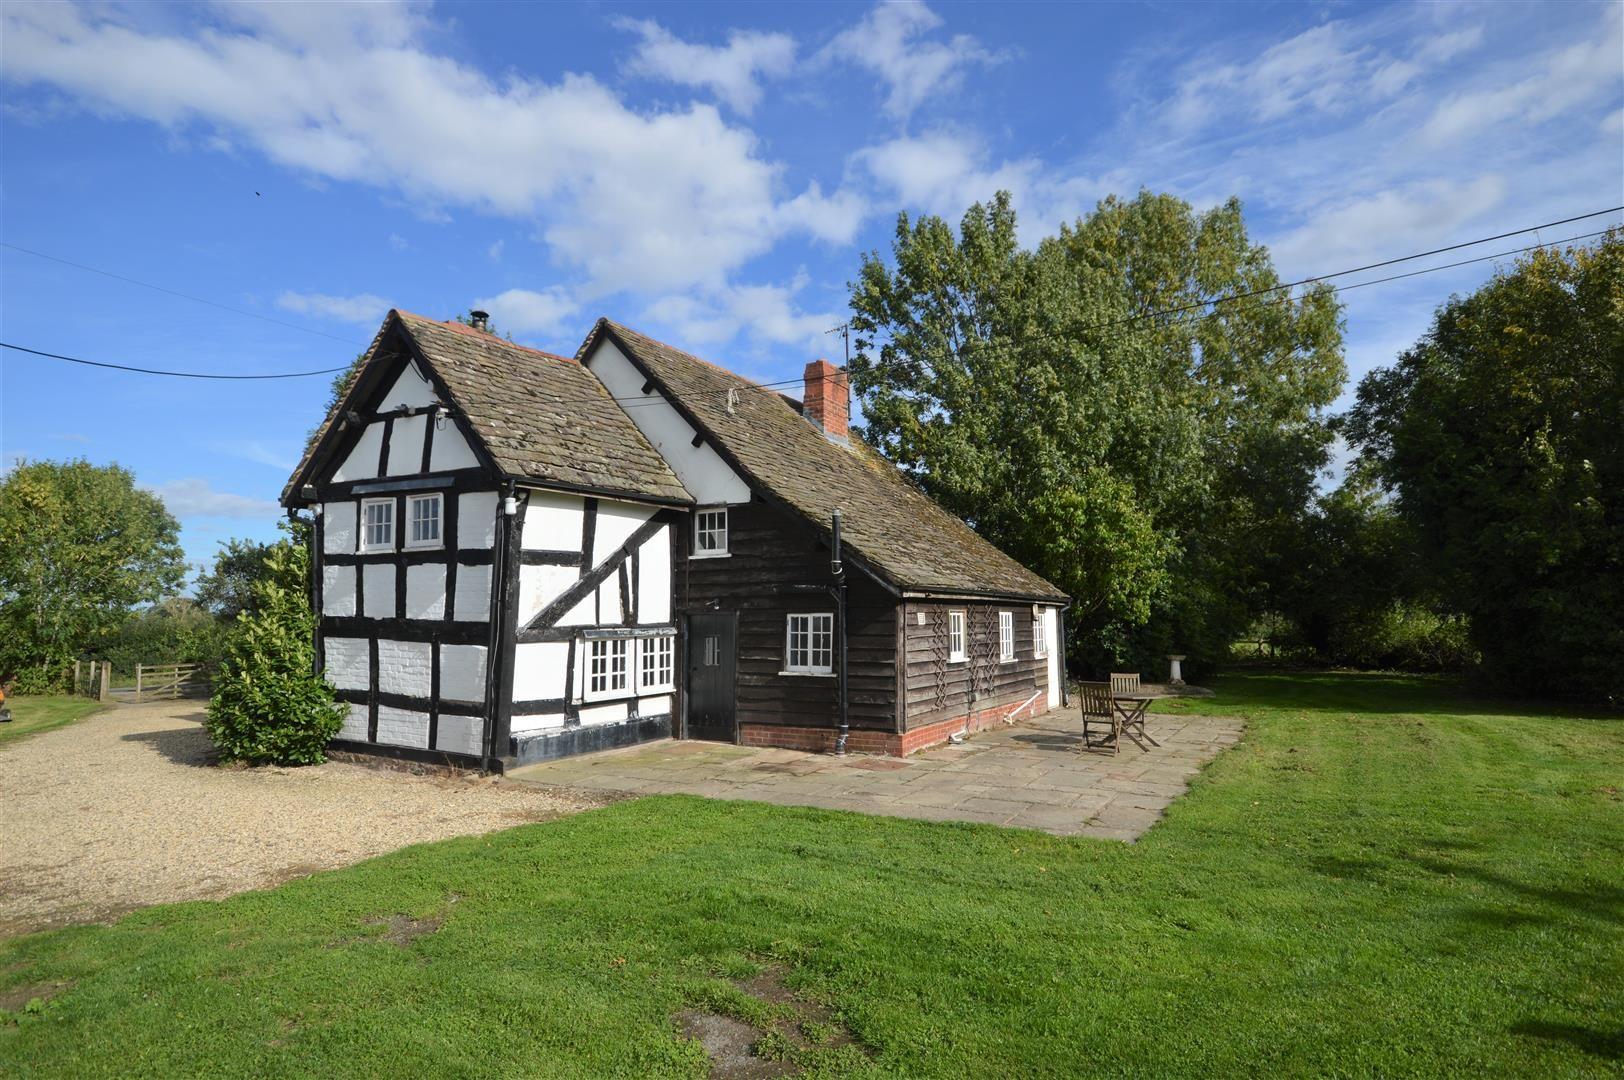 3 bed cottage for sale in Pembridge  - Property Image 1